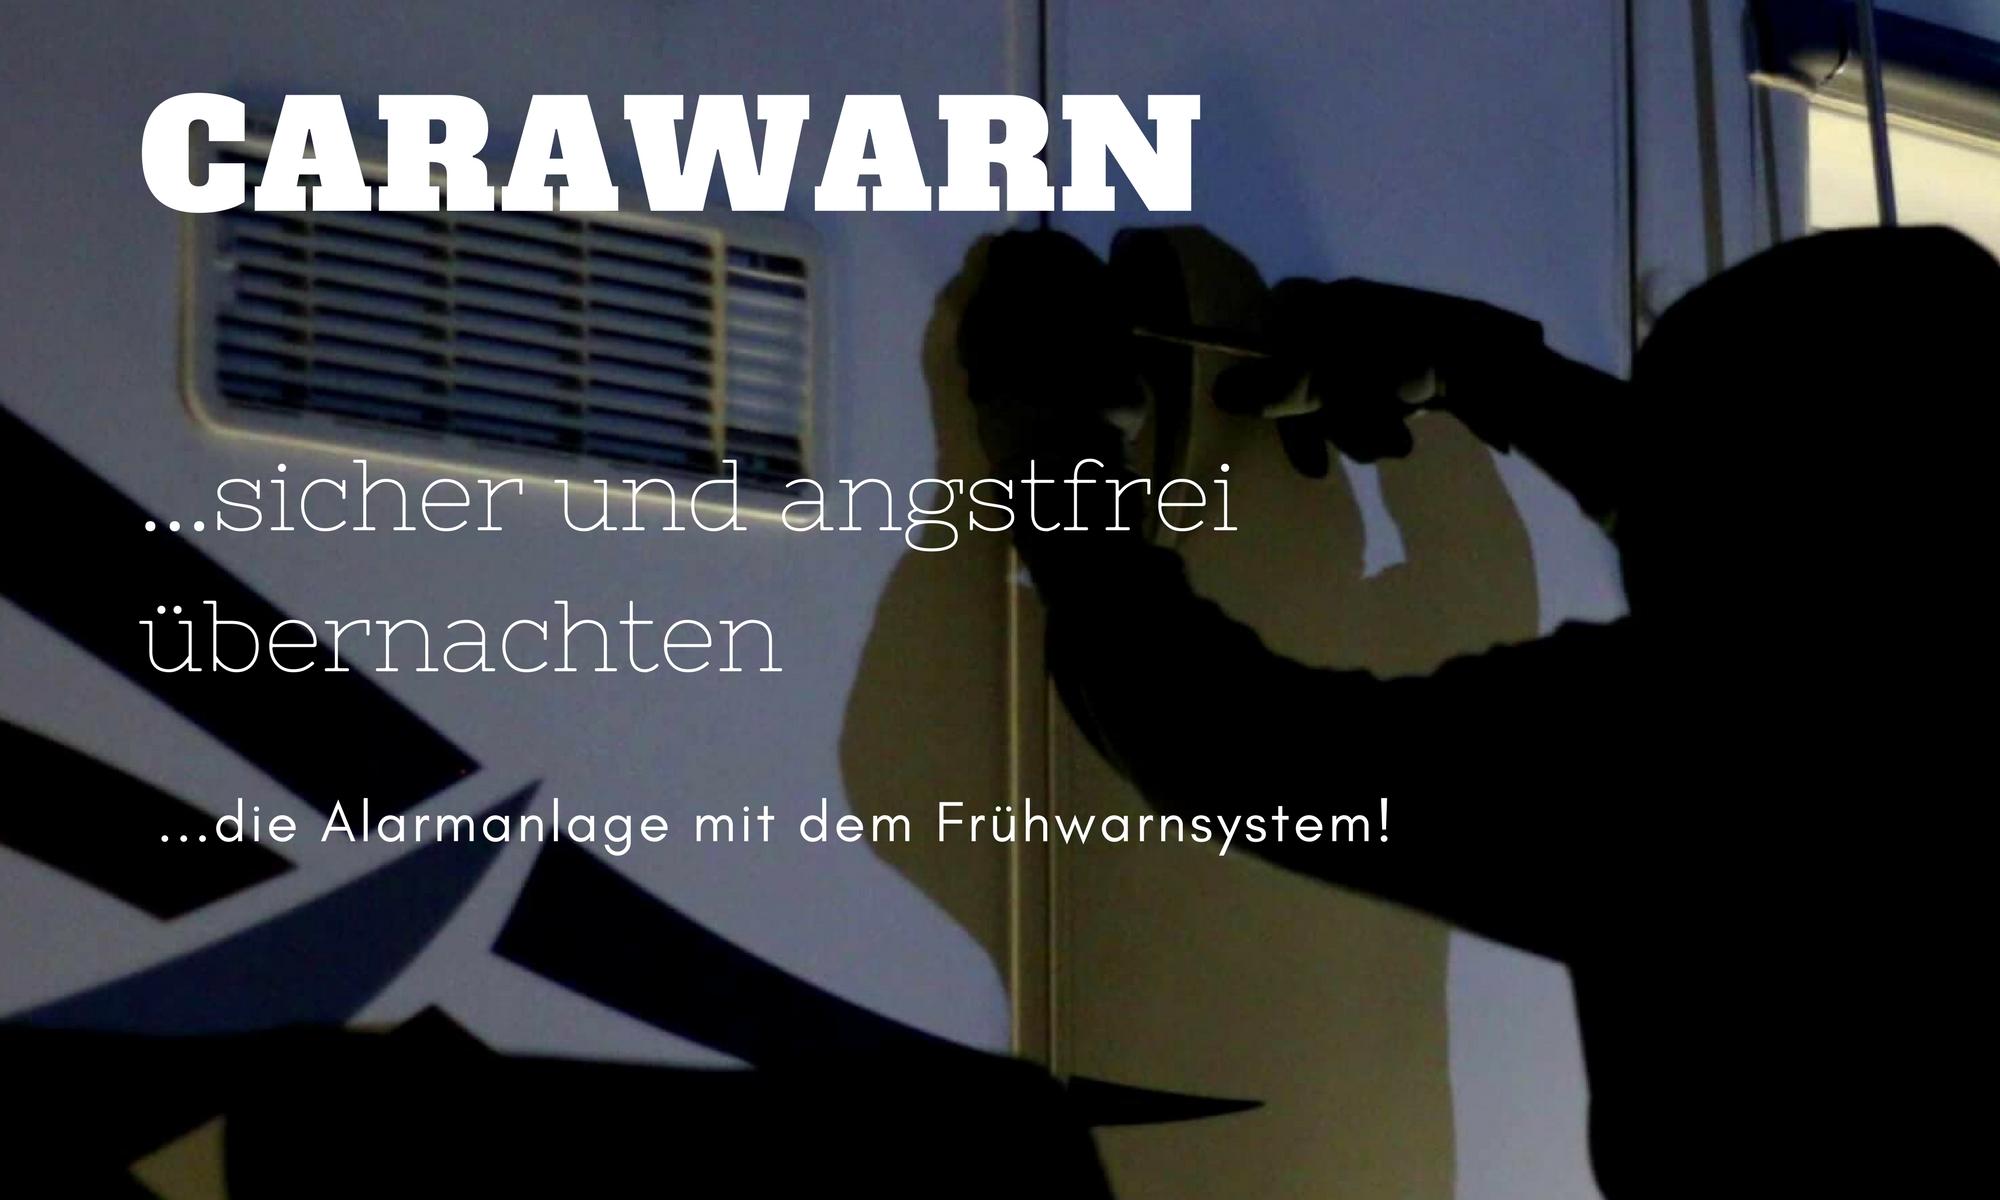 Carawarn Alarmanlage Wohnmobil Wohnwagen